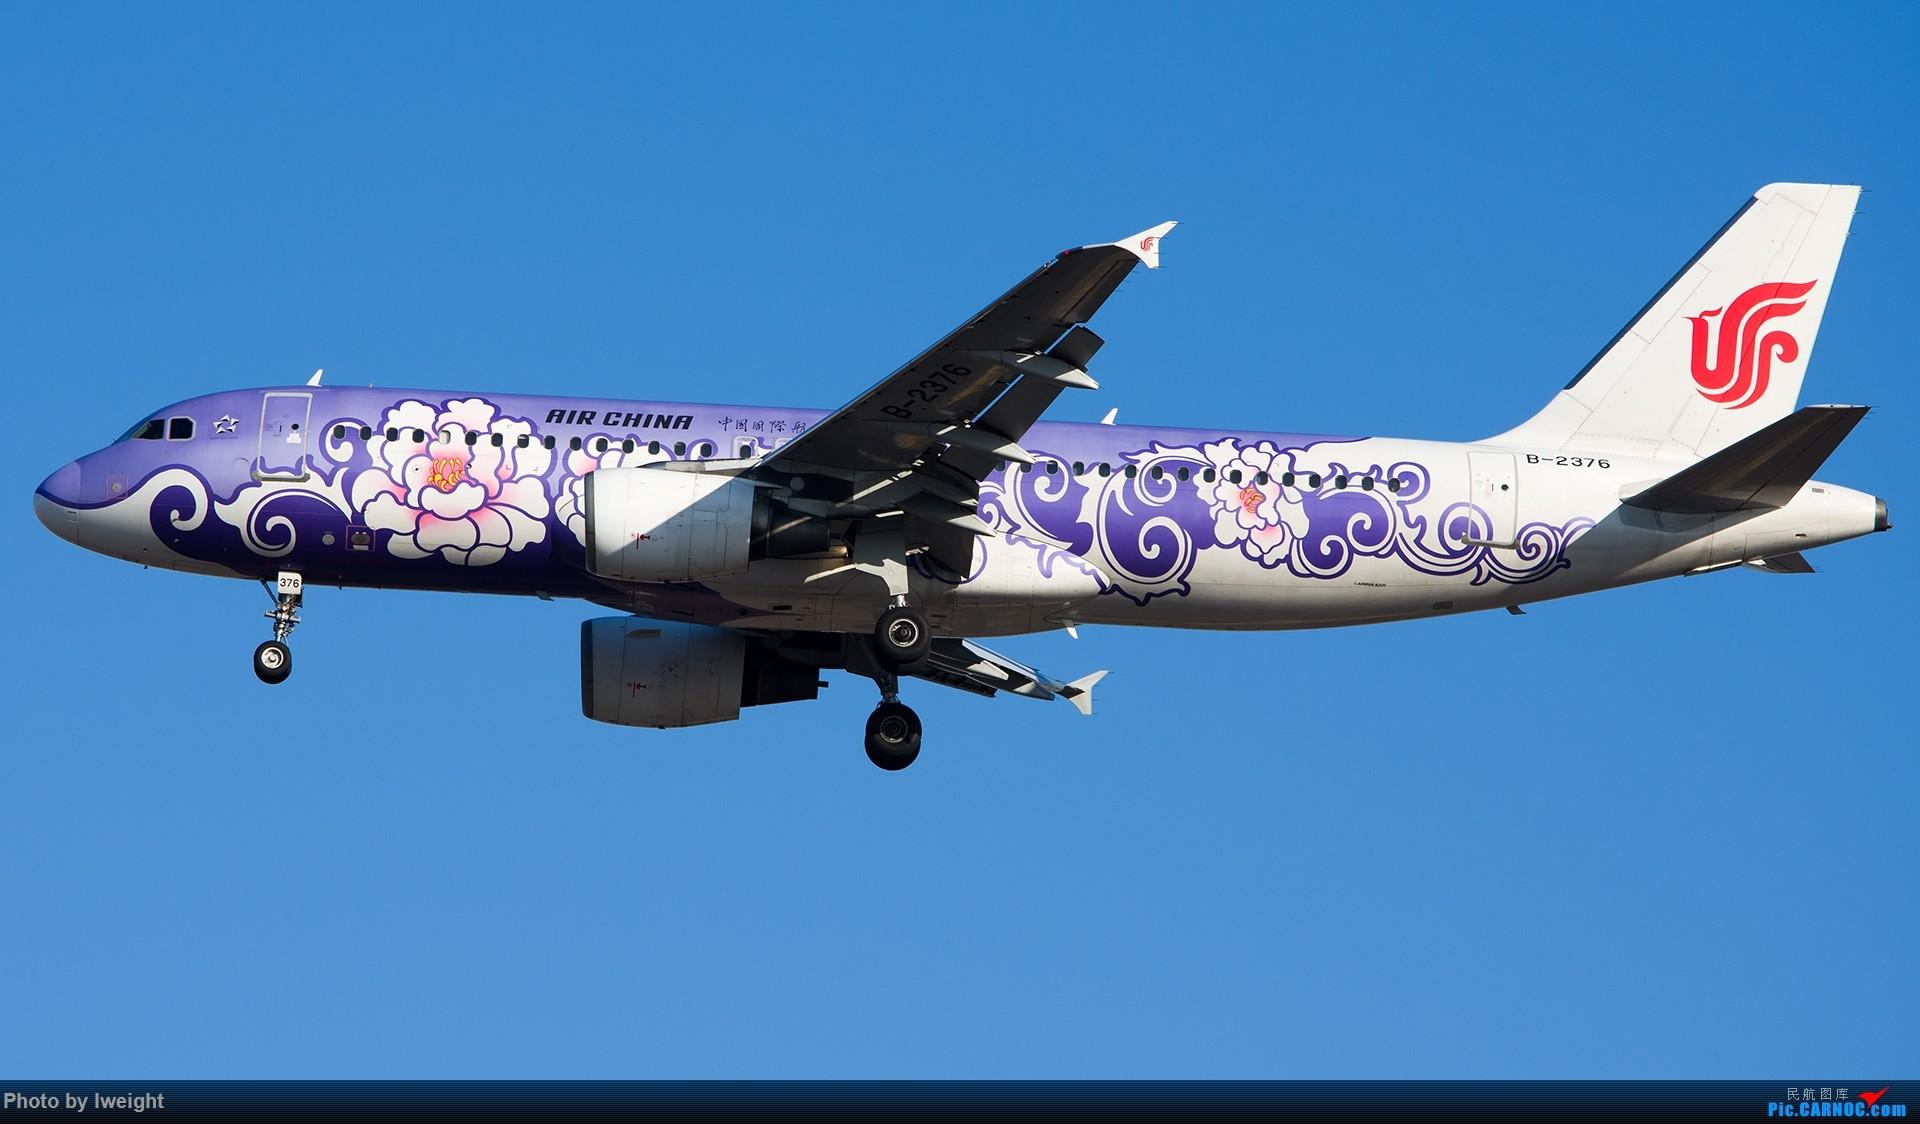 Re:[原创]终于在12月的北京等到了一个晴天的周末,出来拍拍飞机【2015-12-5】 AIRBUS A320-200 B-2376 中国北京首都国际机场